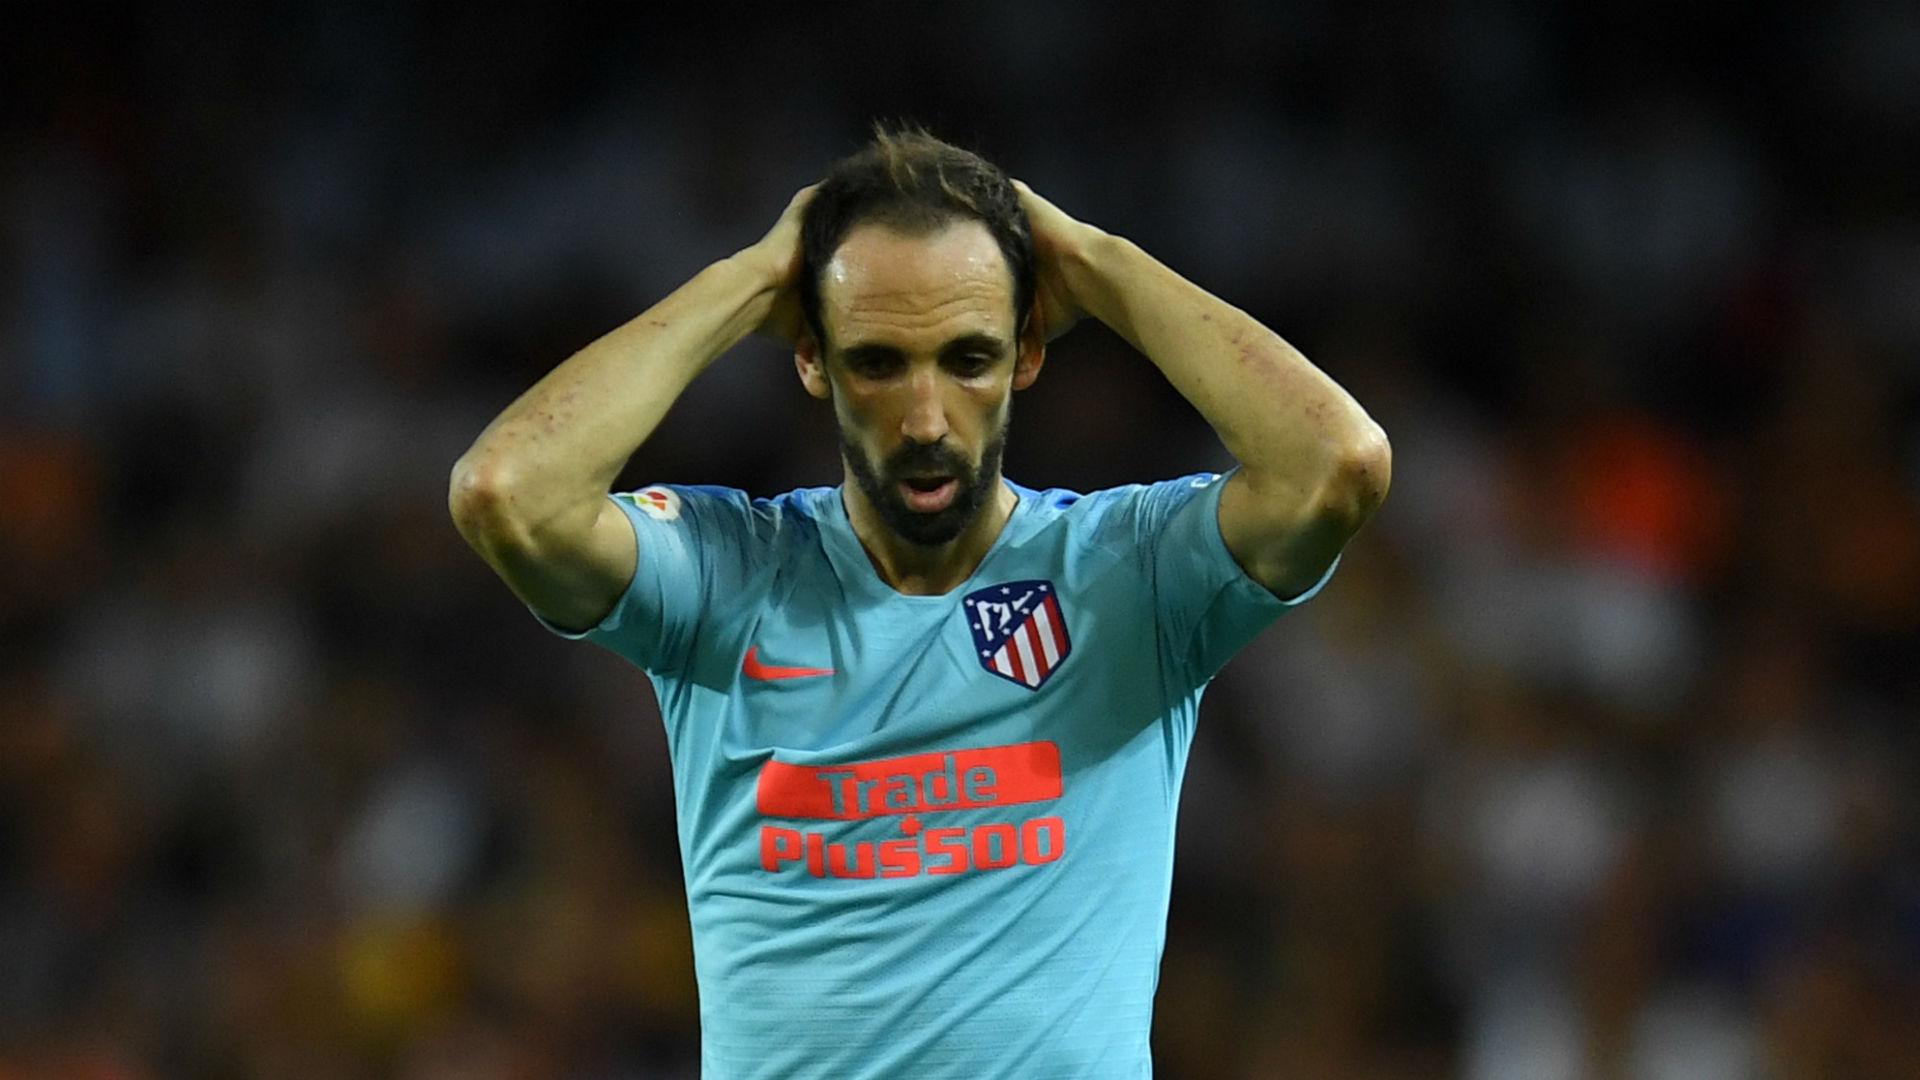 Atletico confirm Juanfran hamstring injury